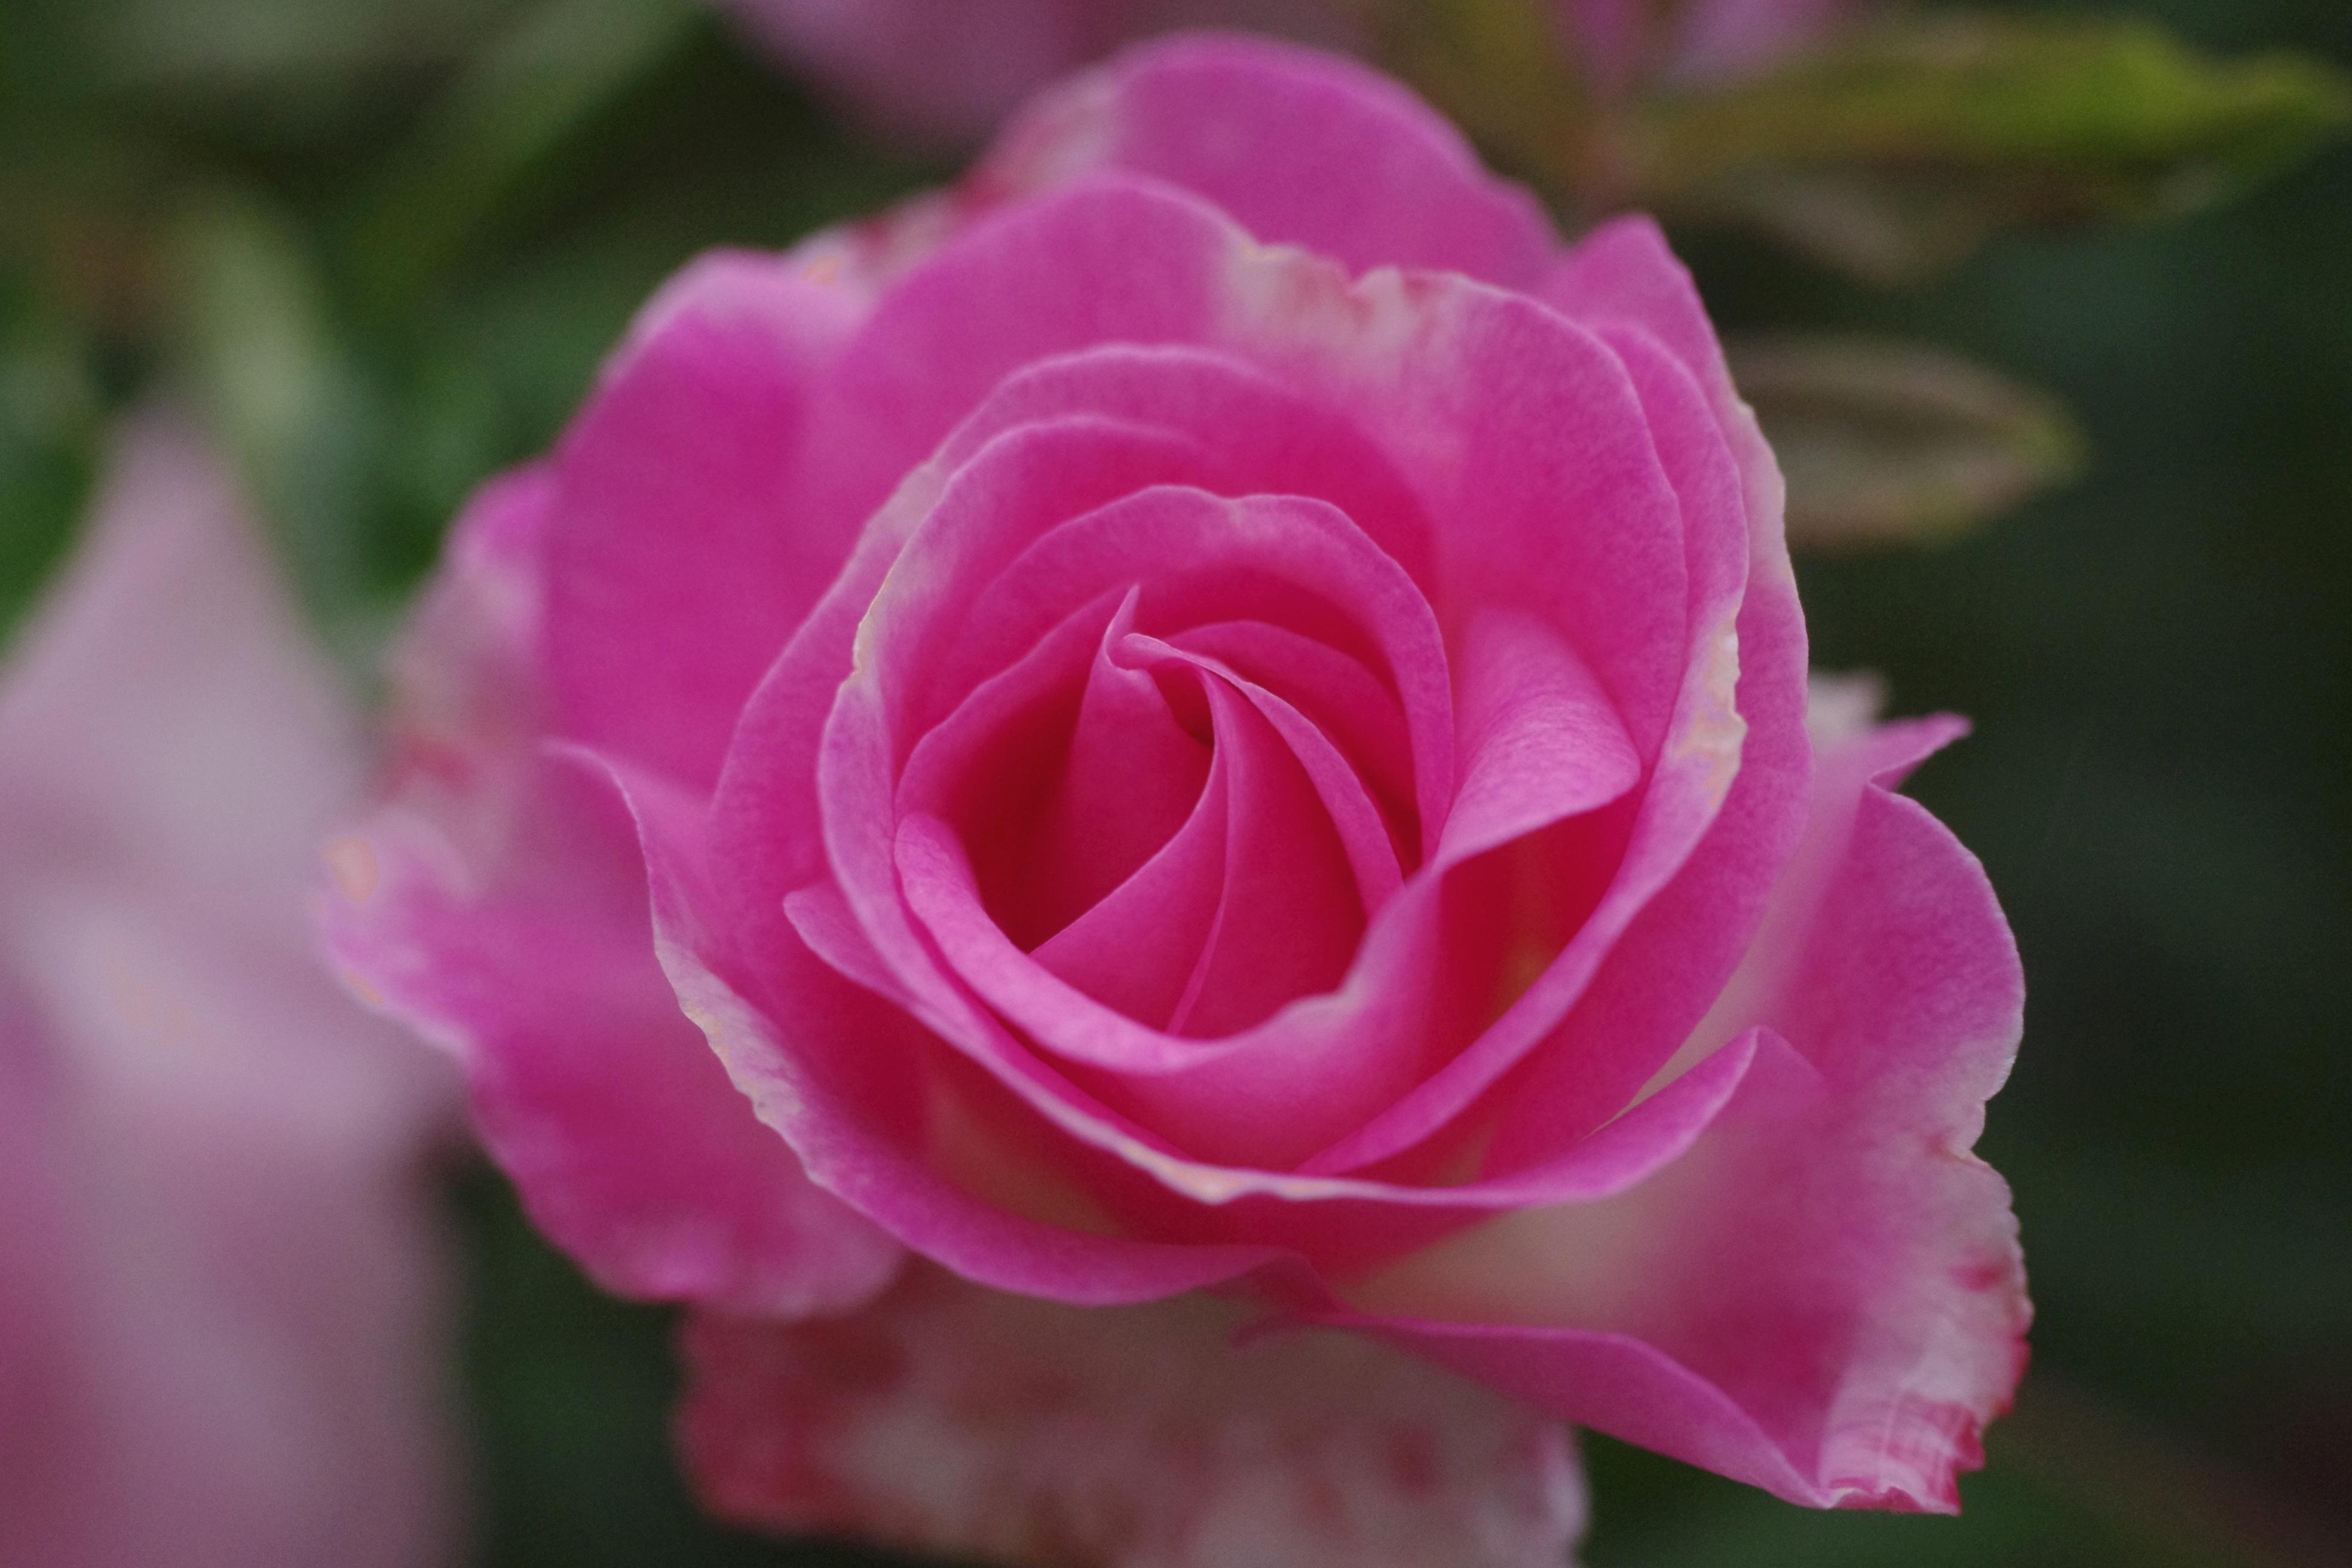 fotos gratis naturaleza p talo verano rosado flora p talos floribunda entradas. Black Bedroom Furniture Sets. Home Design Ideas